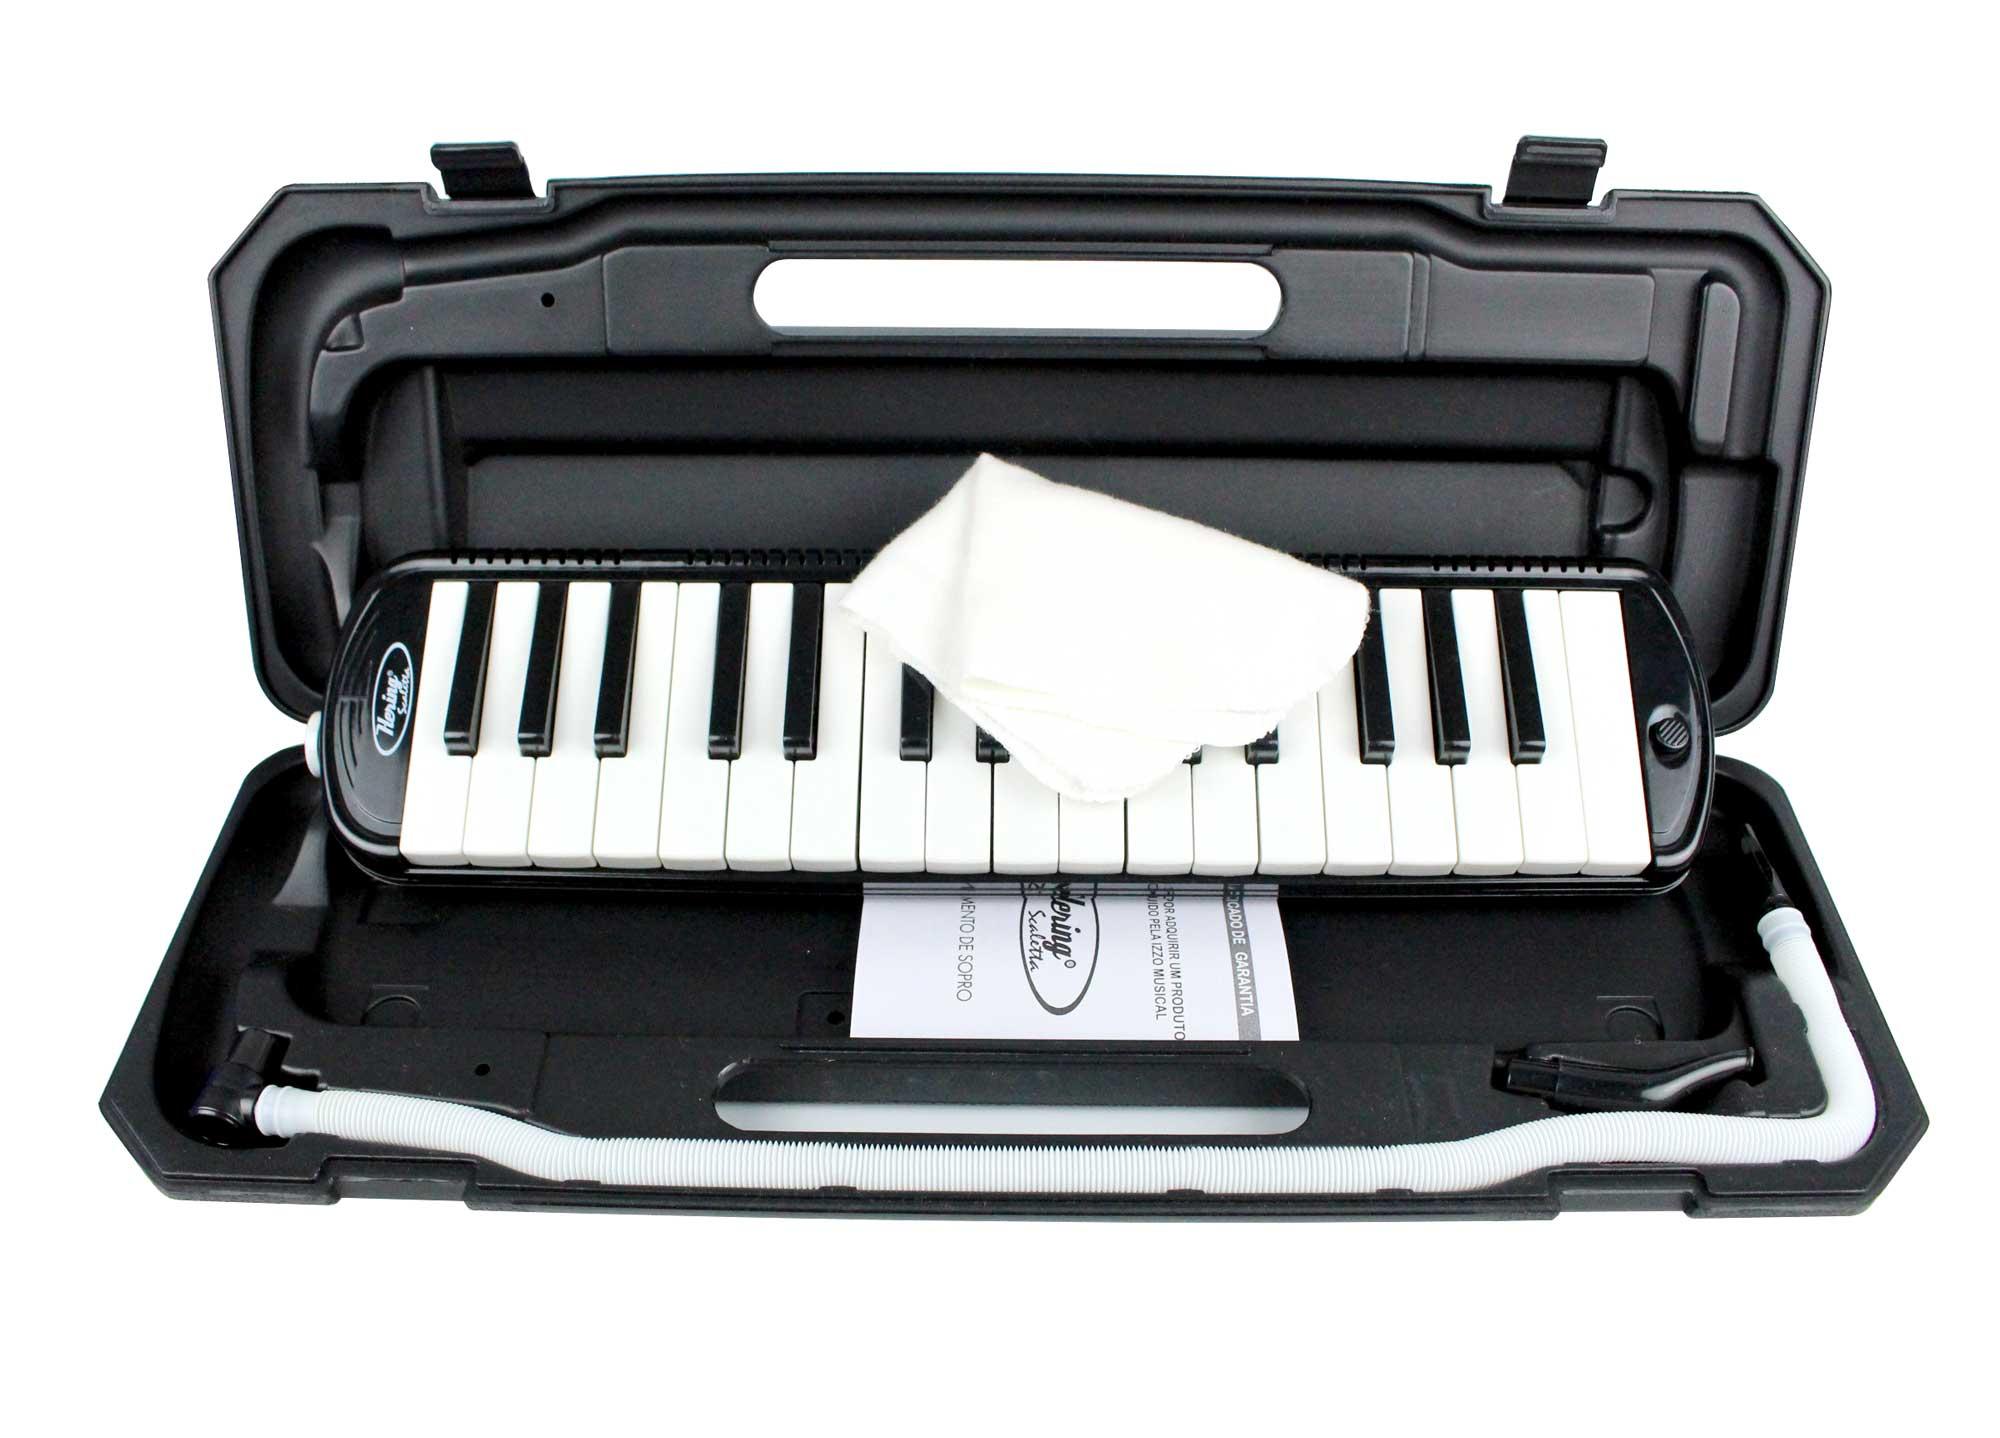 Escaleta melodica de 32 teclas na cor preto | Alcance de F a C | Hering | EH8863